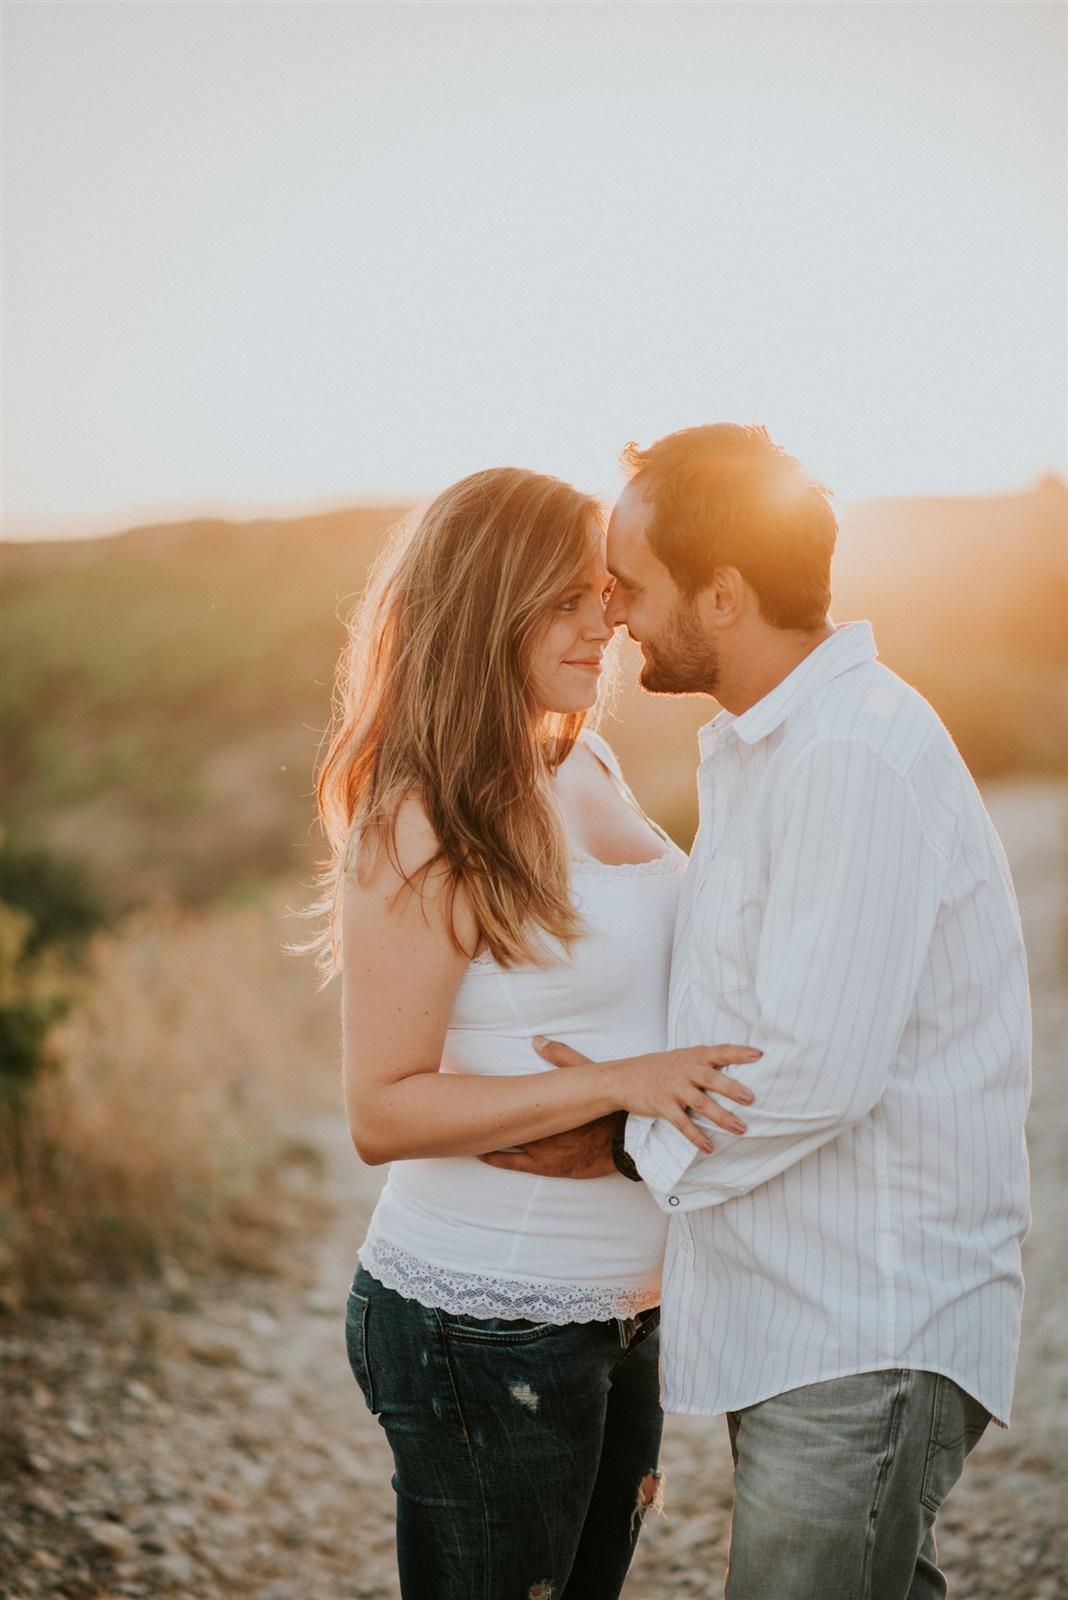 Premantura Istria | Erika & Ivan pregnancy session